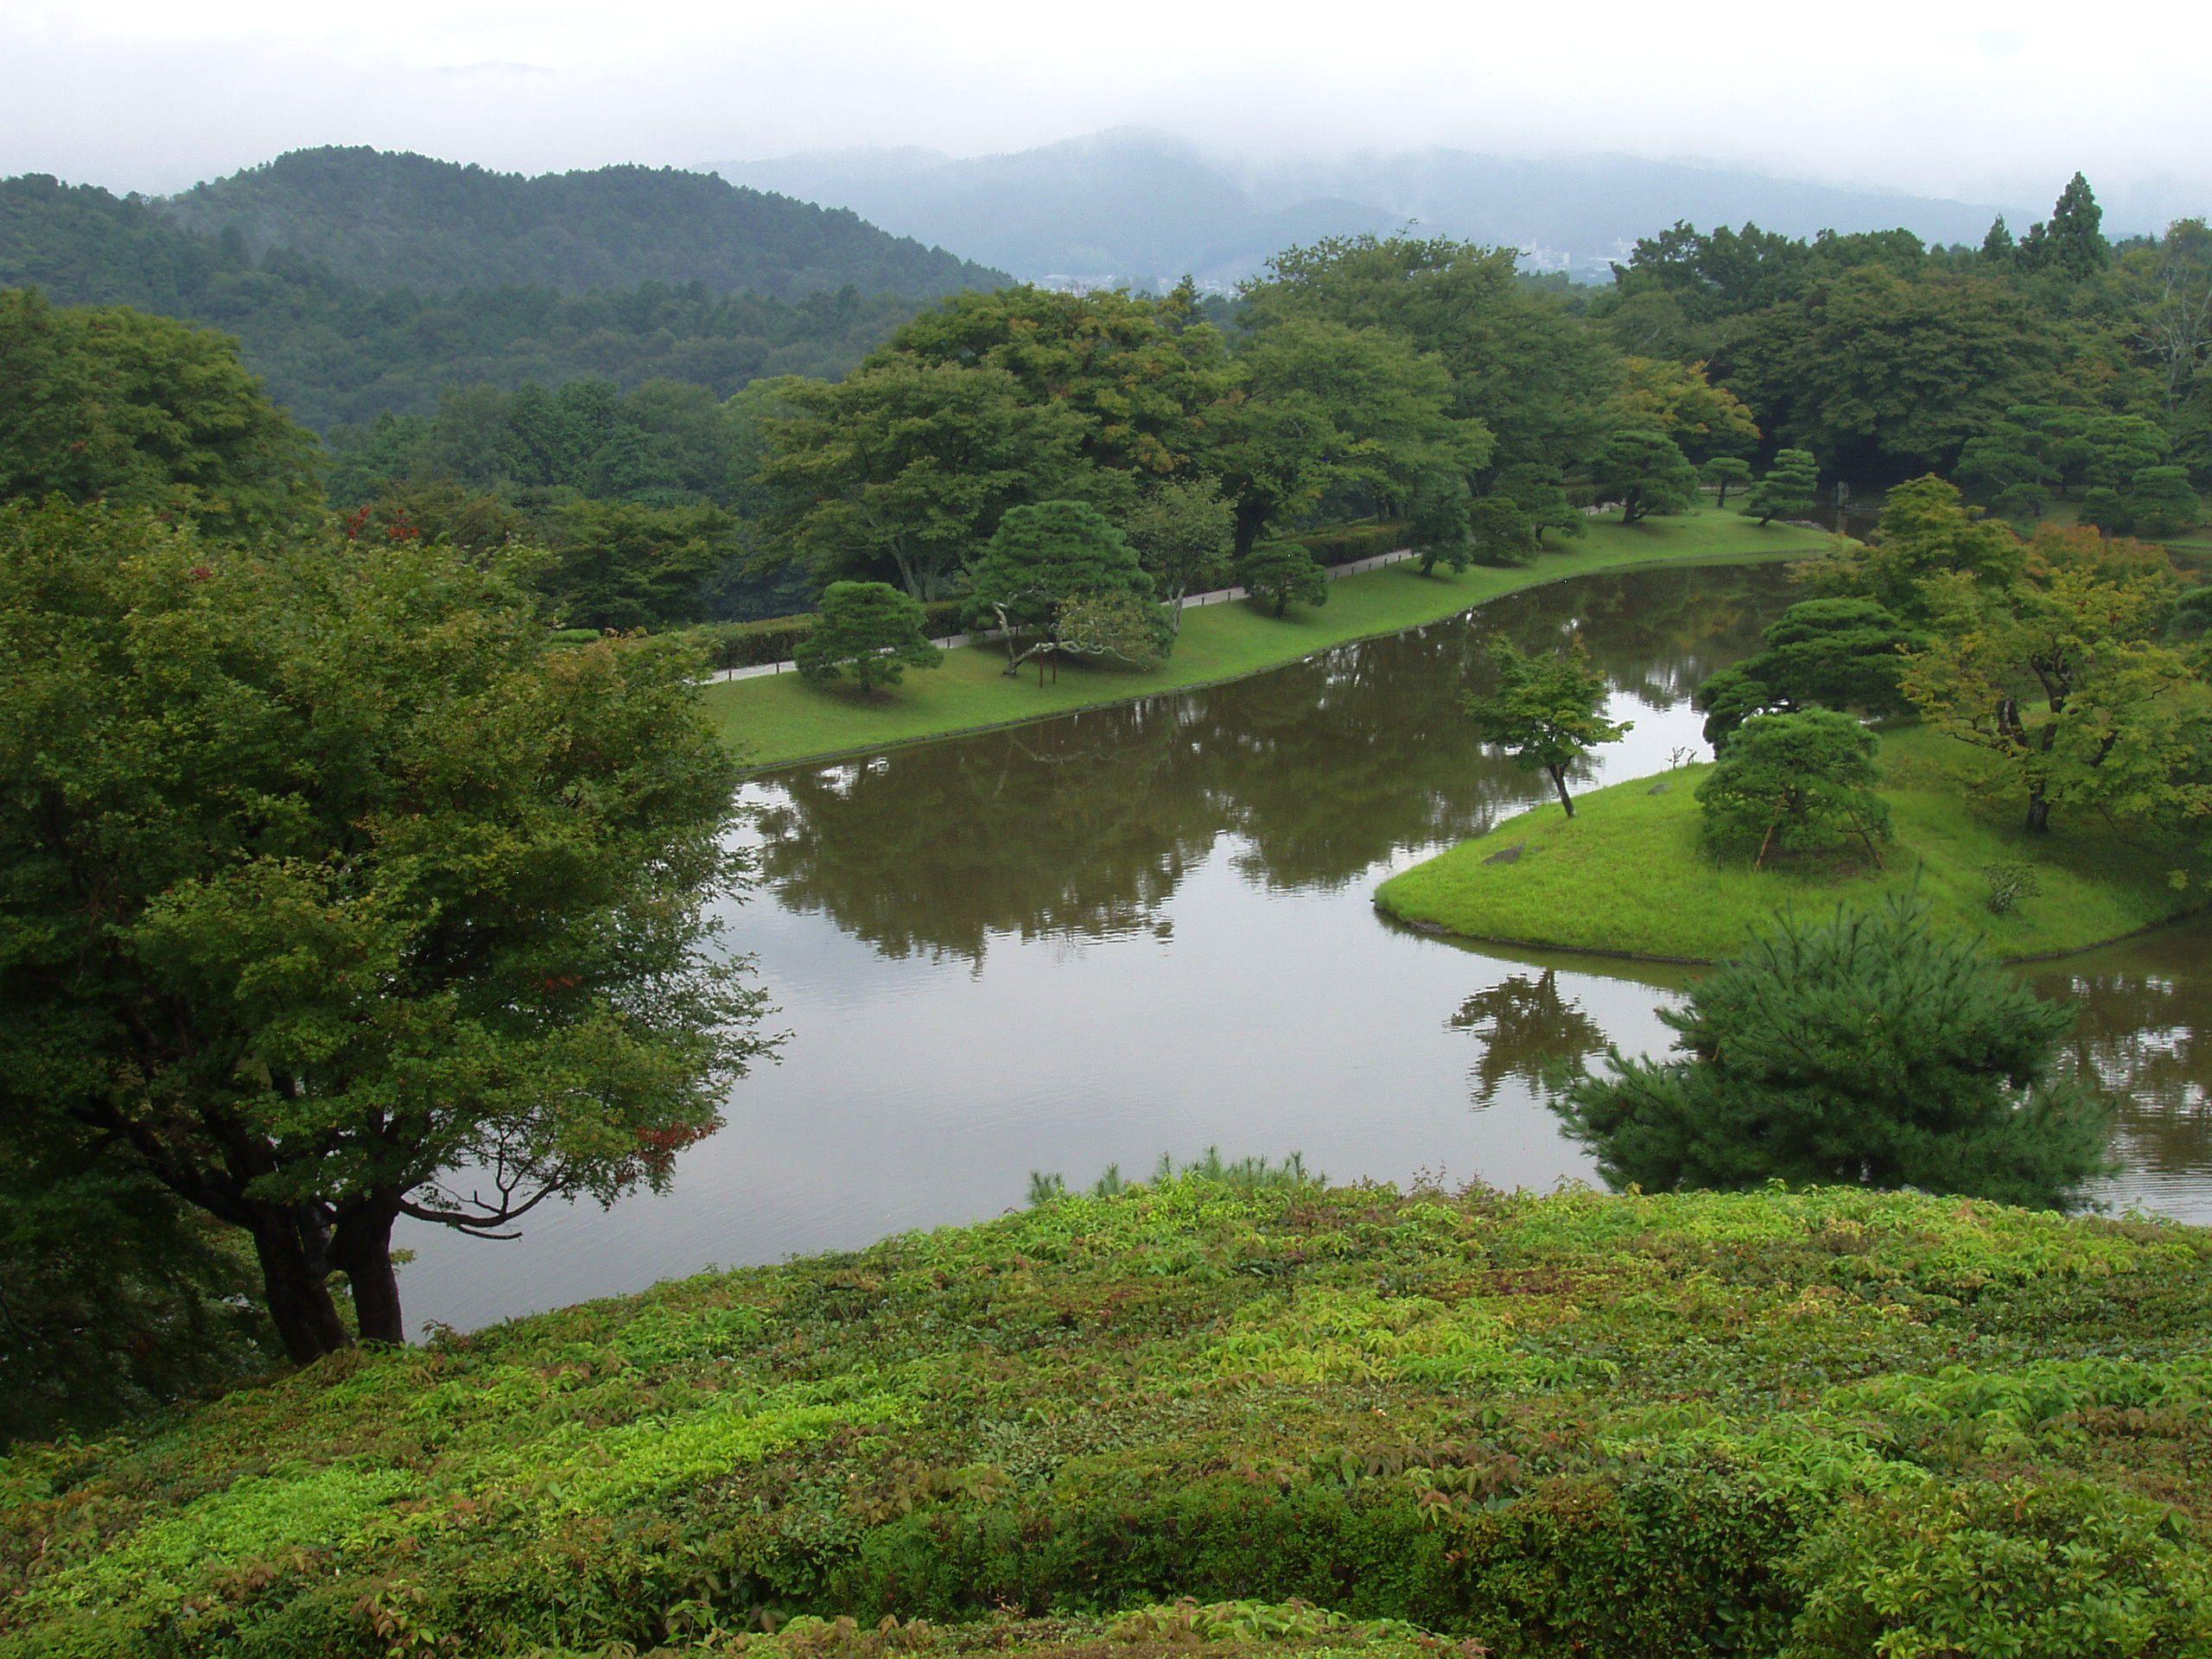 http://upload.wikimedia.org/wikipedia/commons/a/a4/Shugaku-in_Imperial_Villa_-_Upper_Garden_pond.JPG